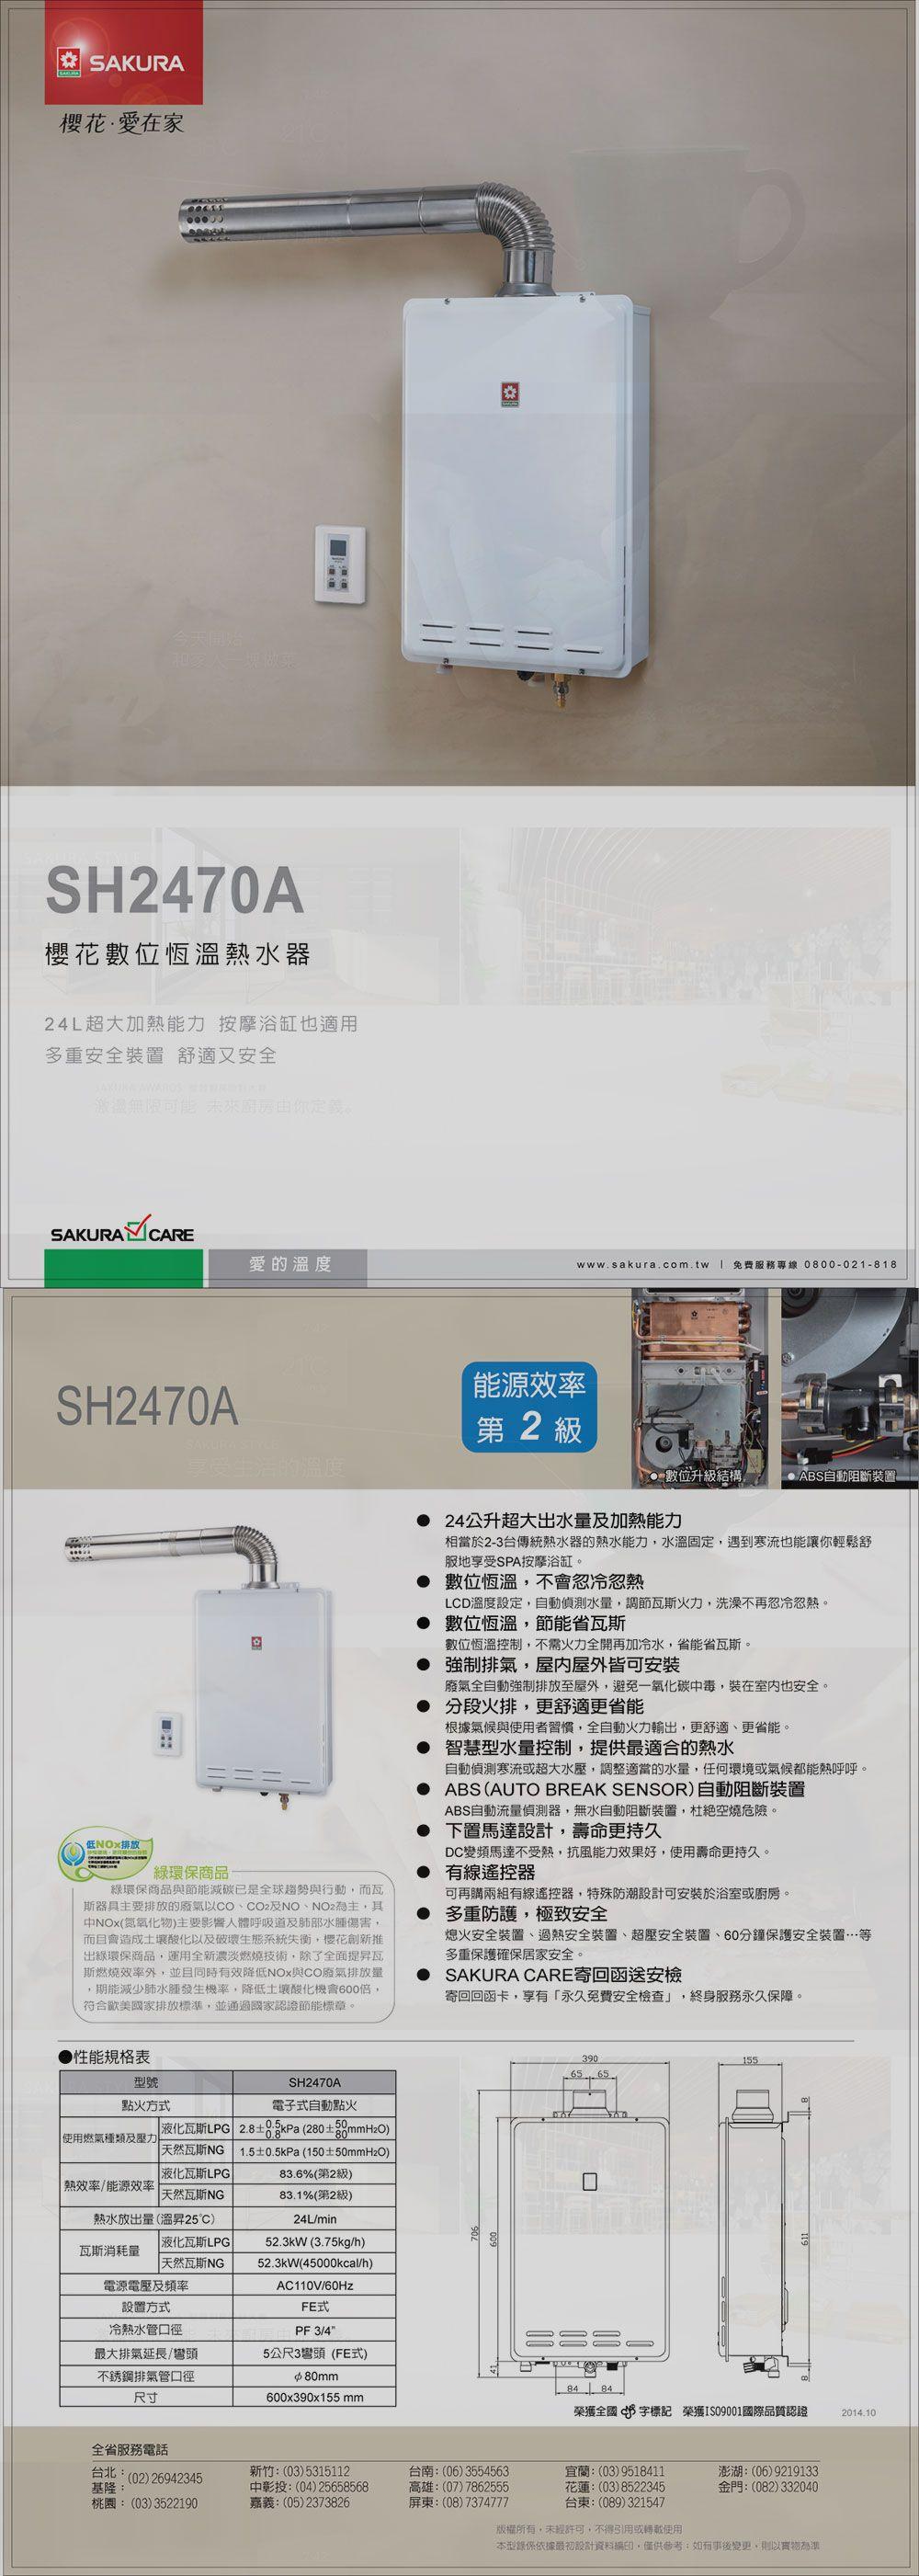 PK/goods/SAKURA/精品館/SH2470A-DM.jpg